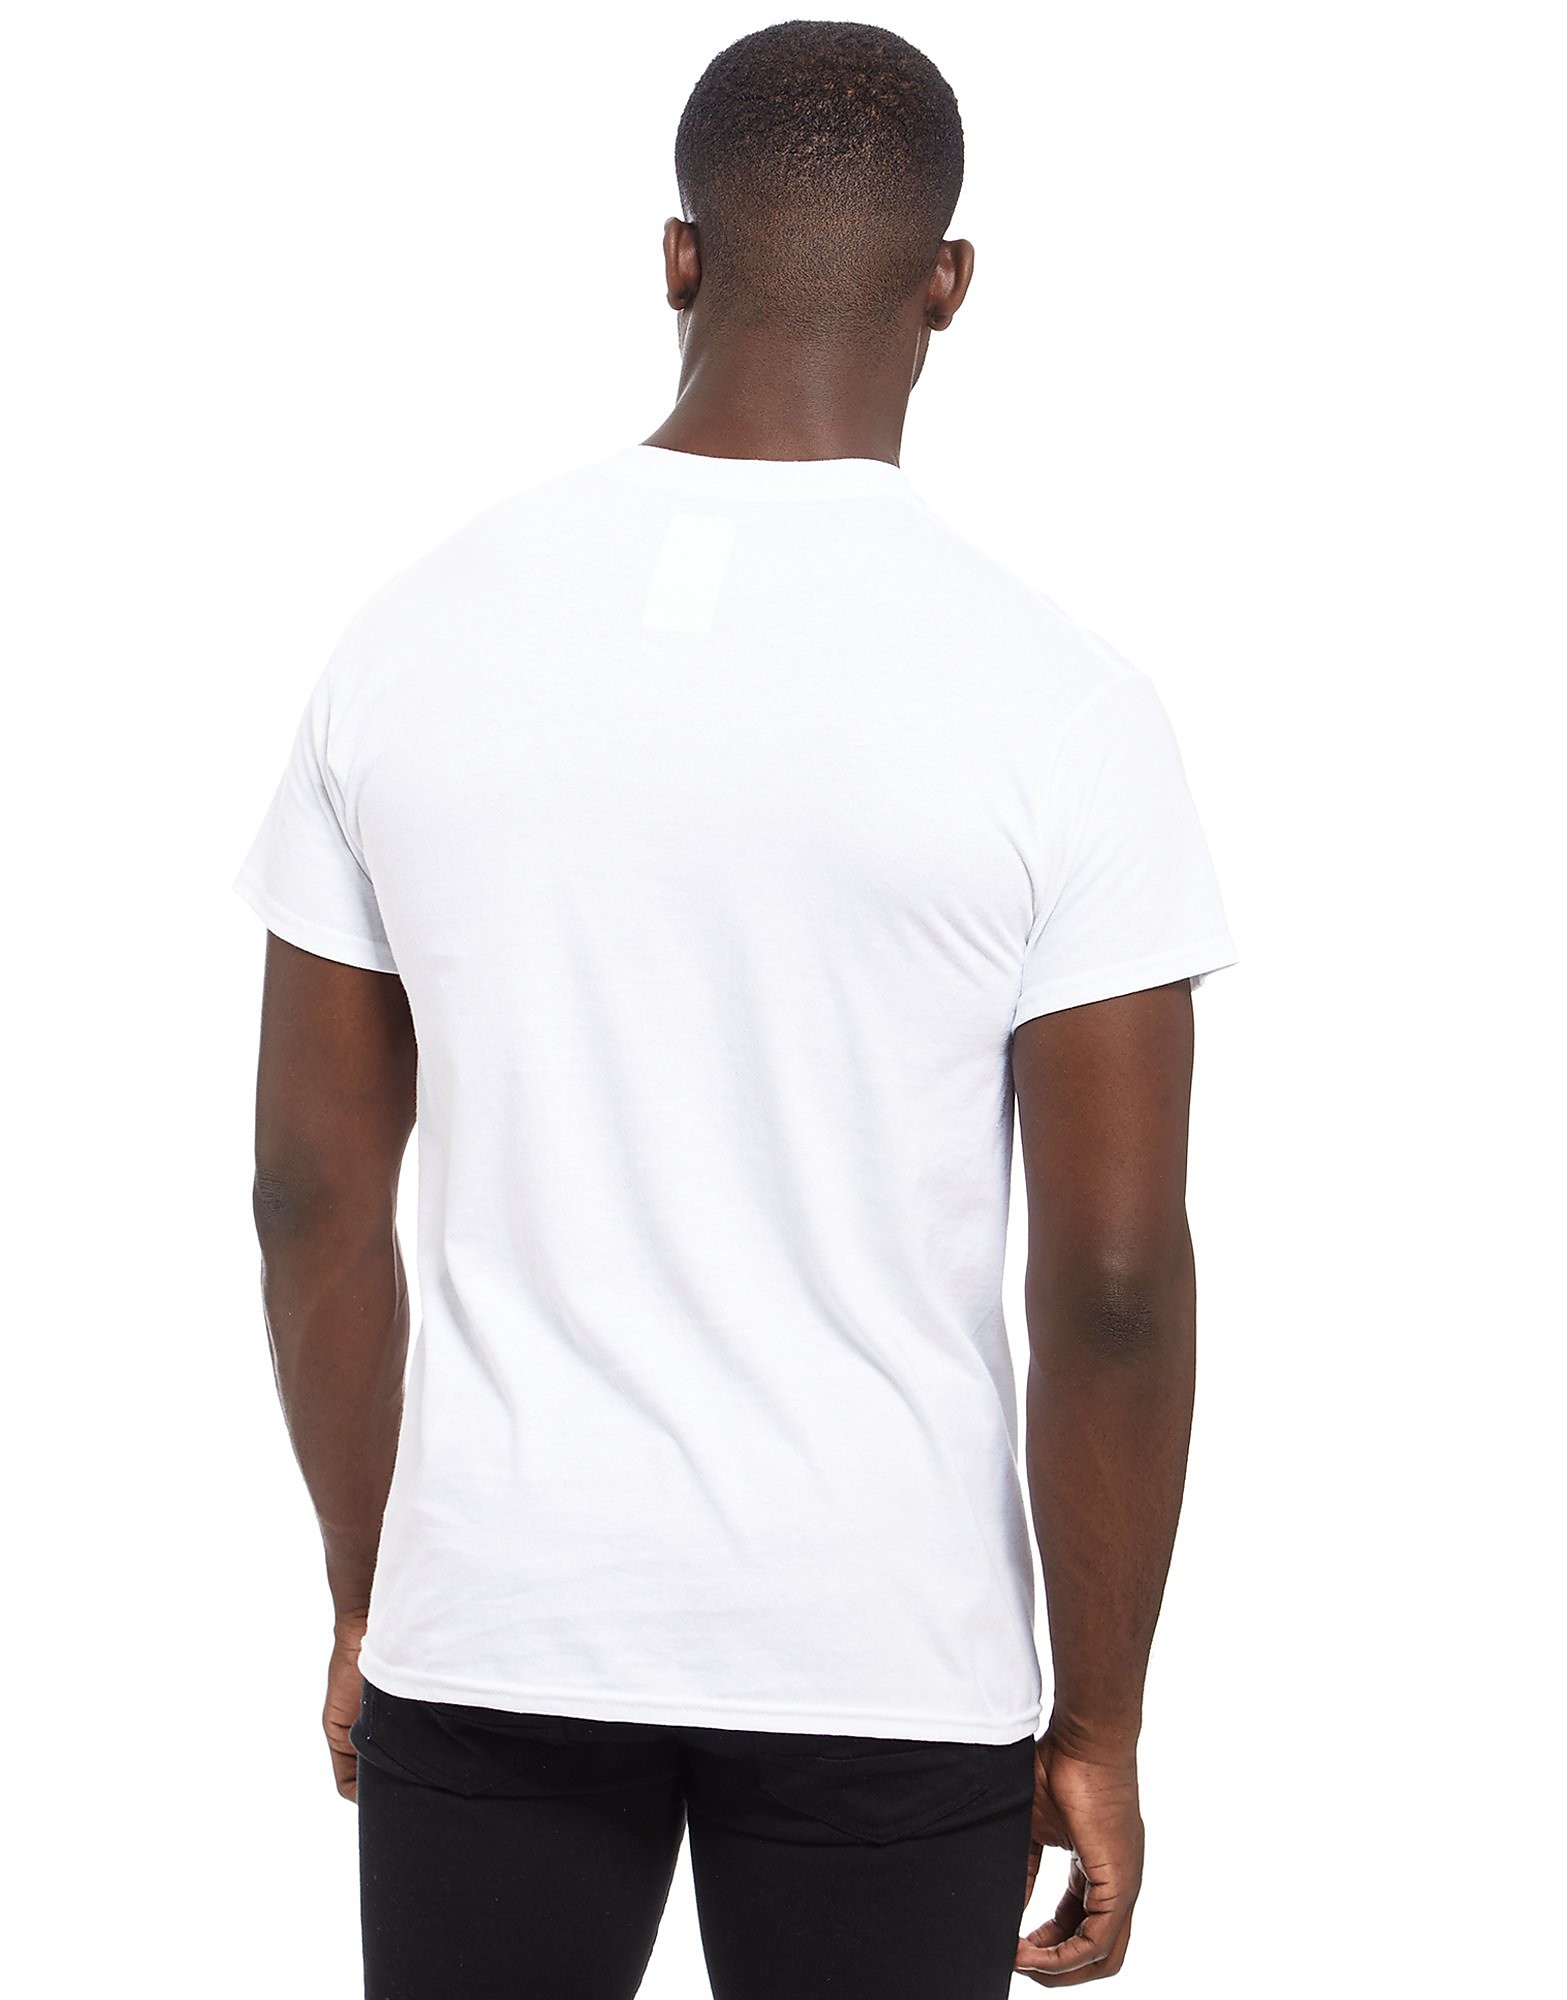 Official Team Tottenham Hotspur FC Established T-Shirt